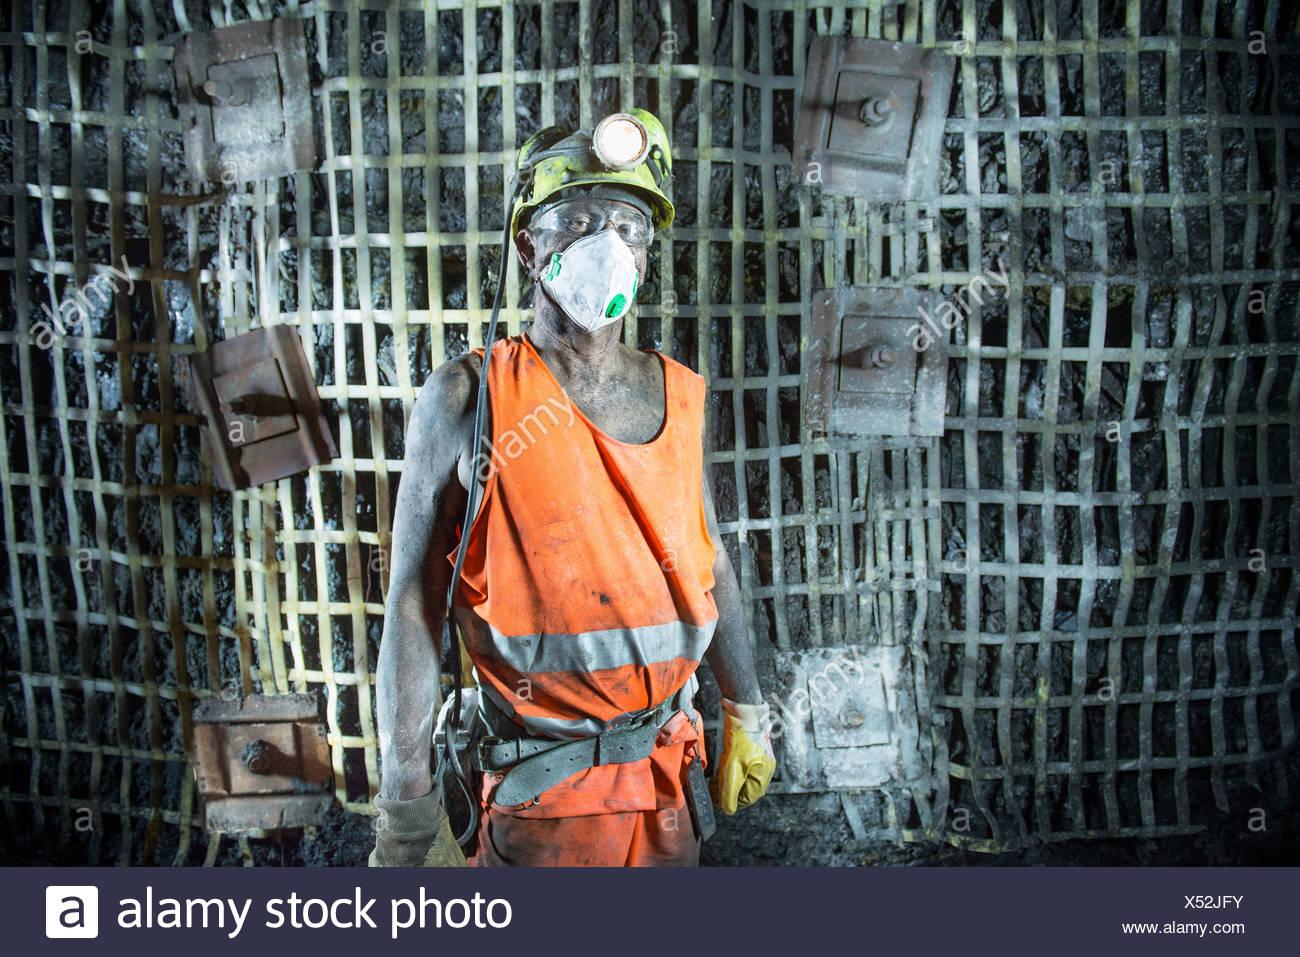 Coal miner standing in mine - Stock Image